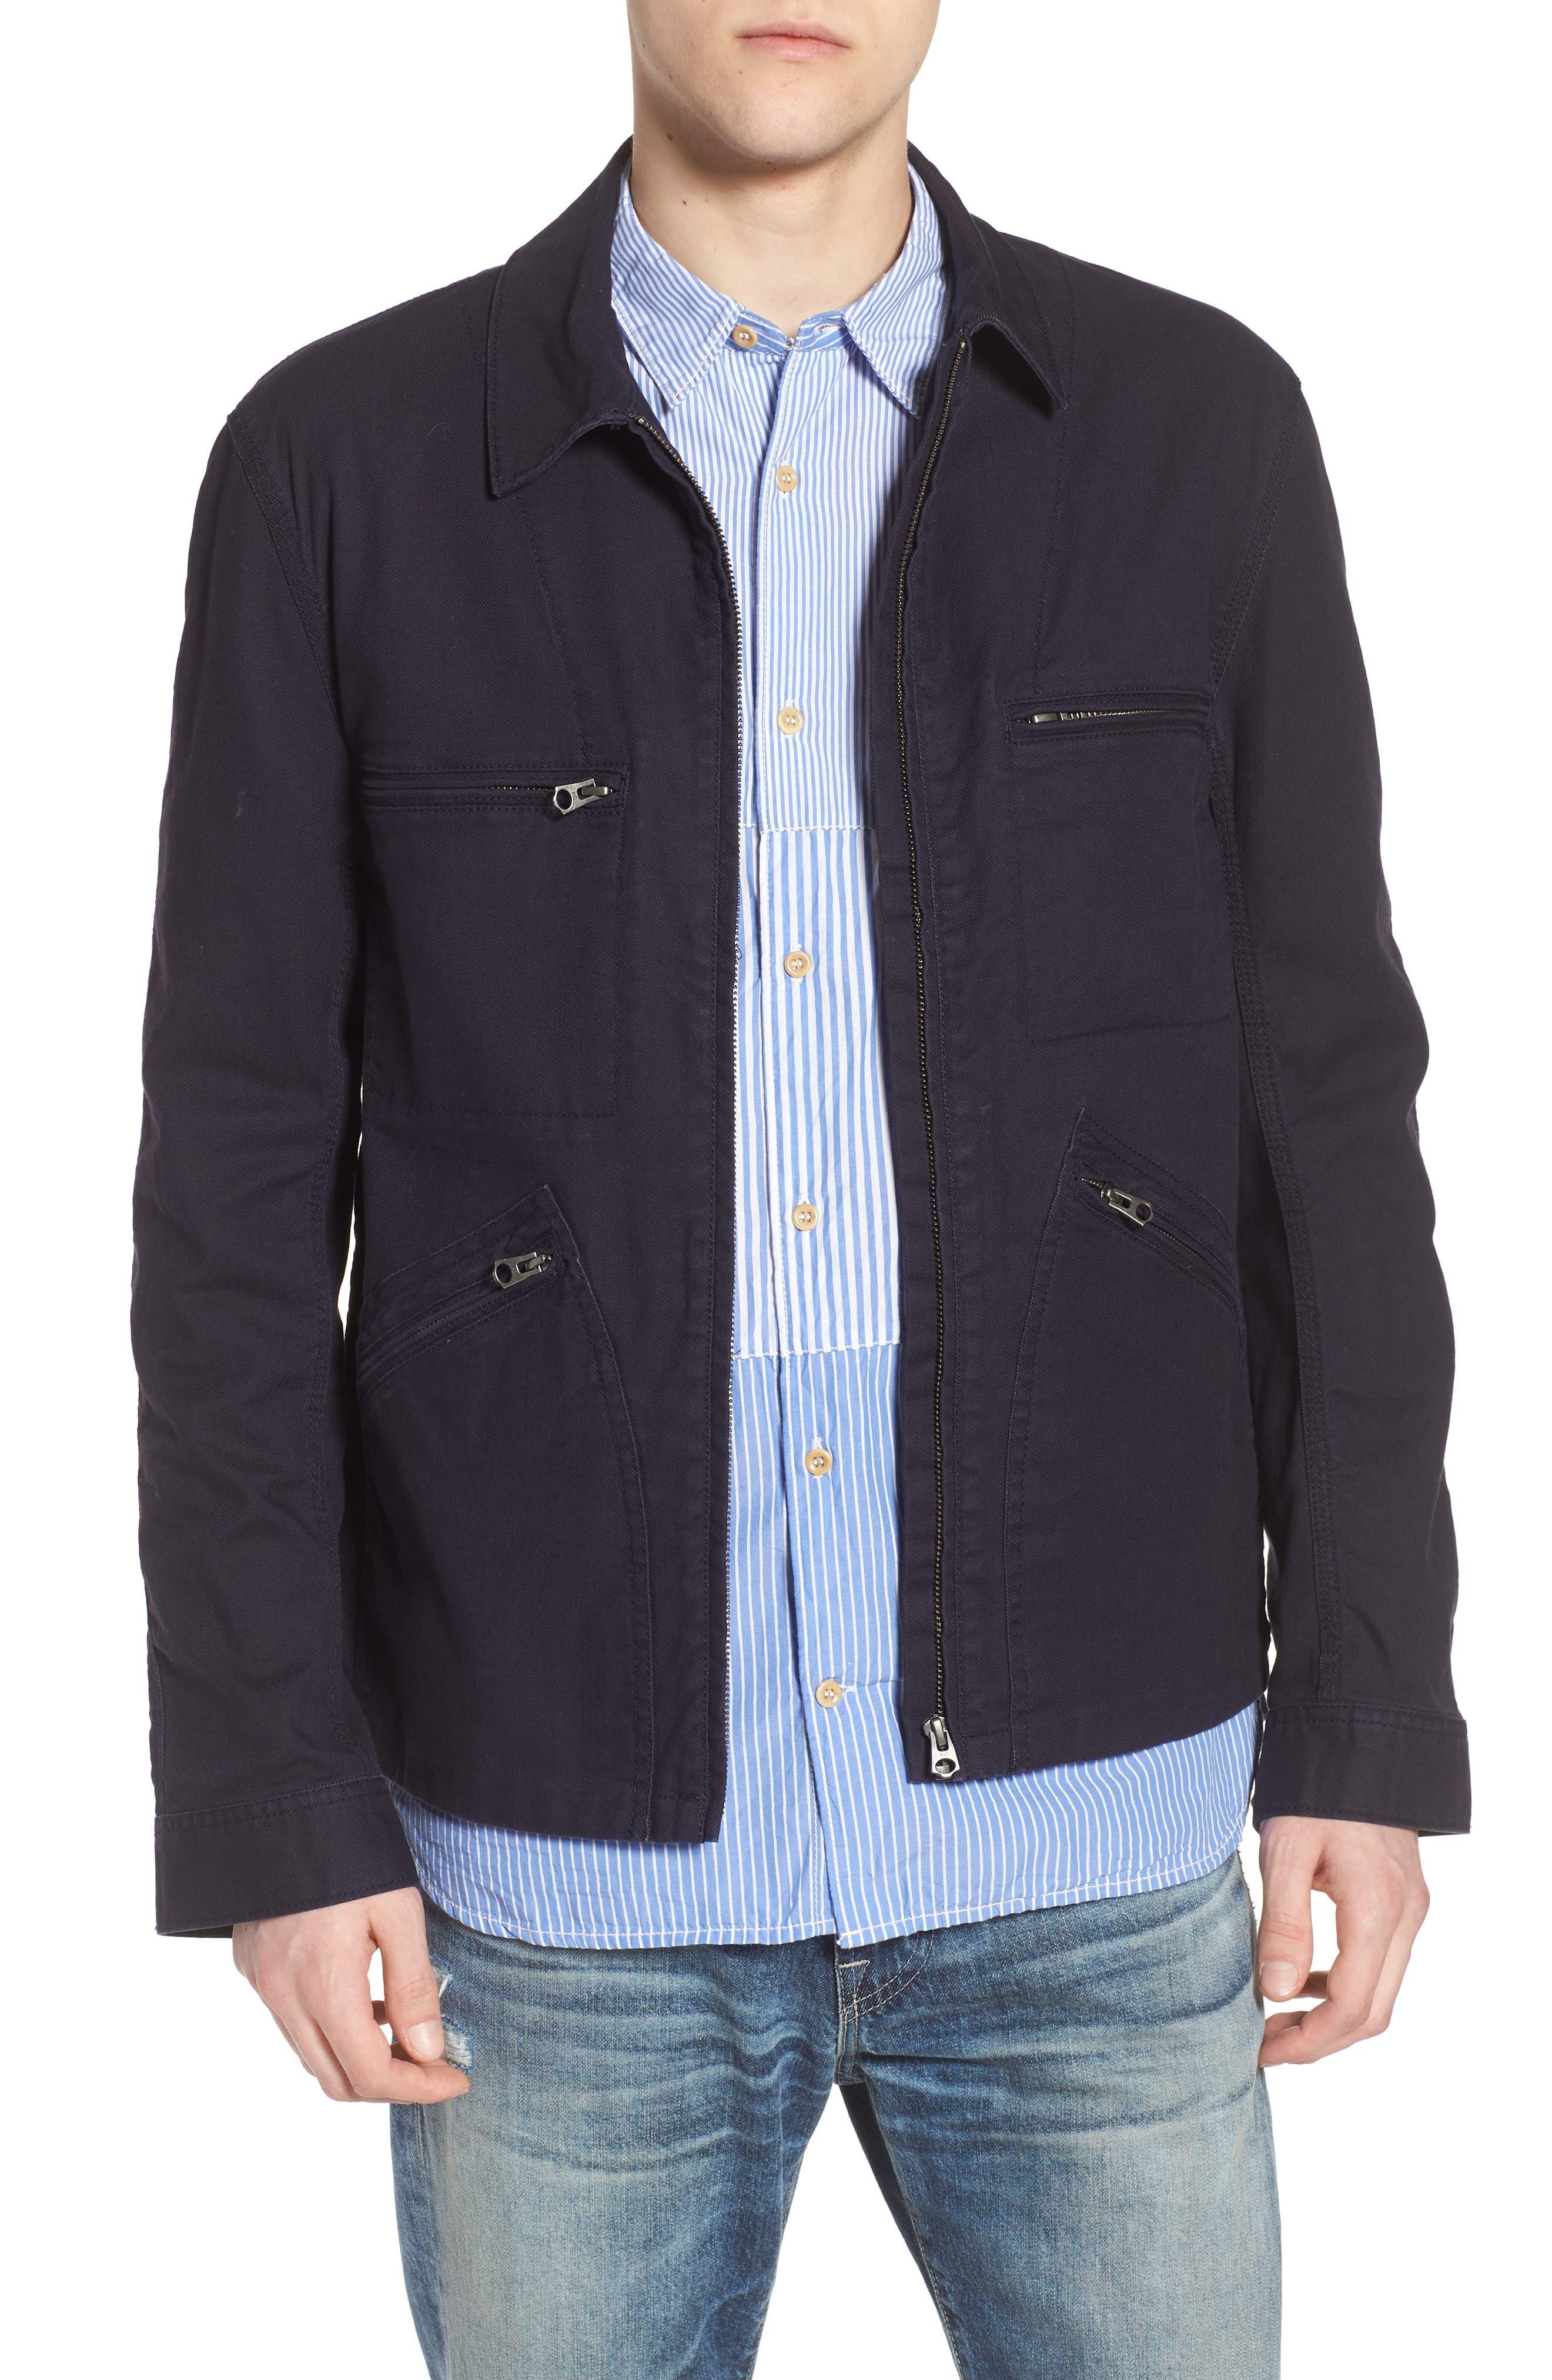 Slim Fit Slub Twill Cotton & Linen Jacket,                         Main,                         color, Black